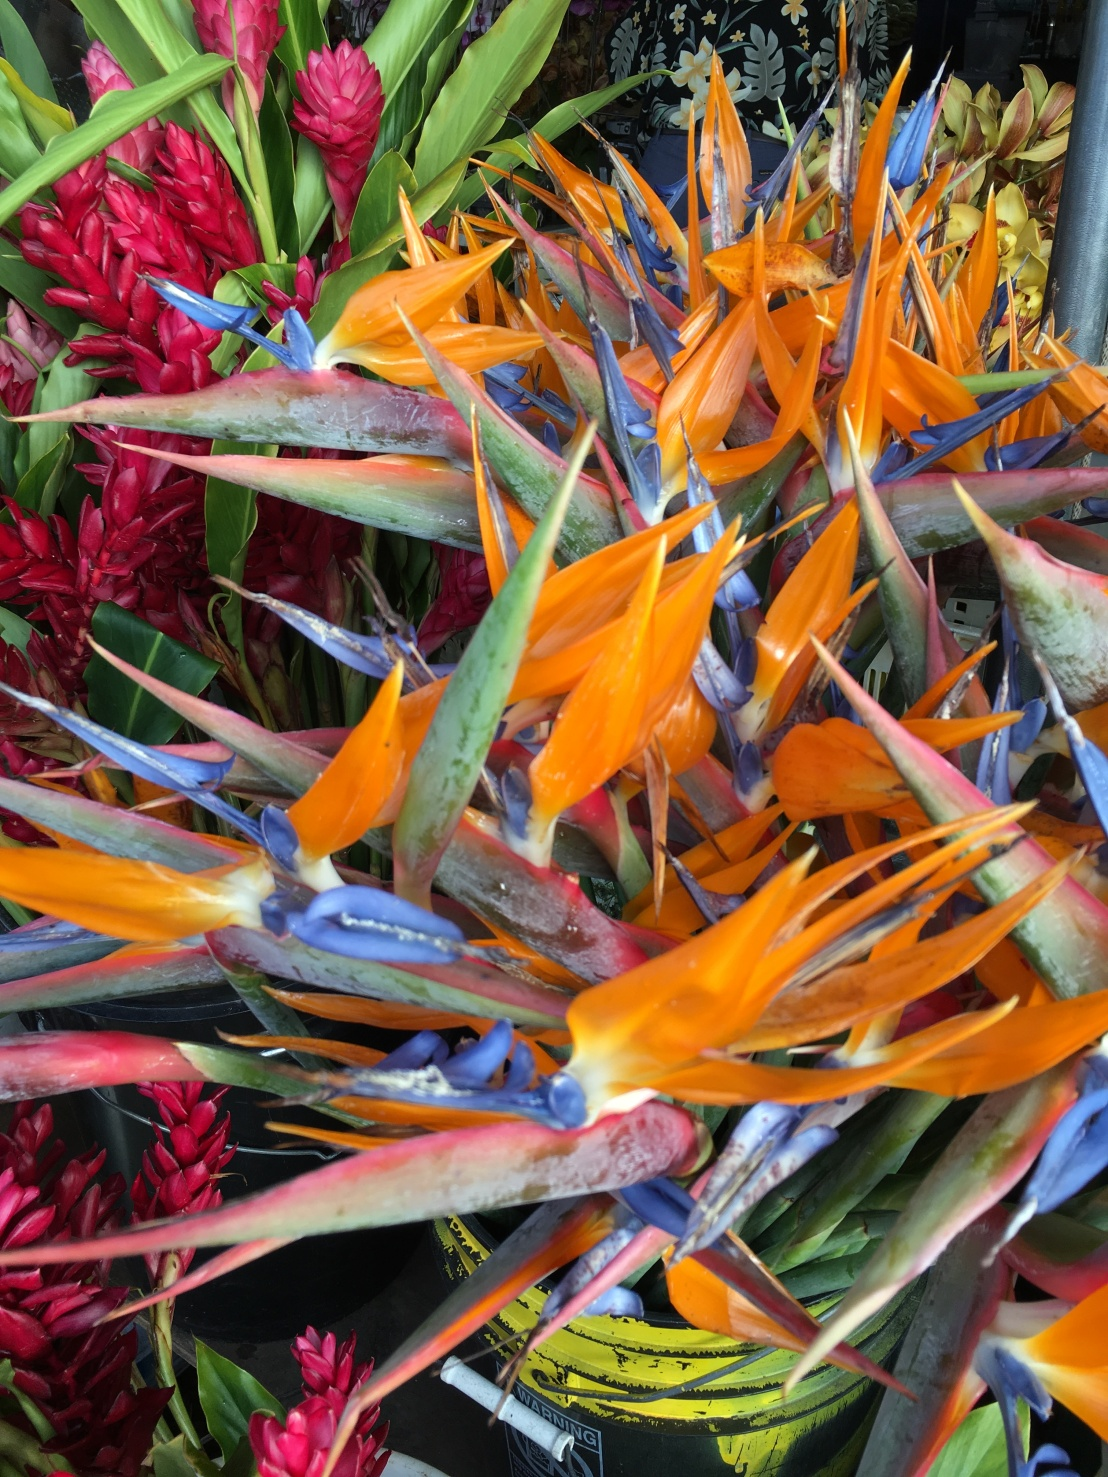 hilo-farmers-market-11